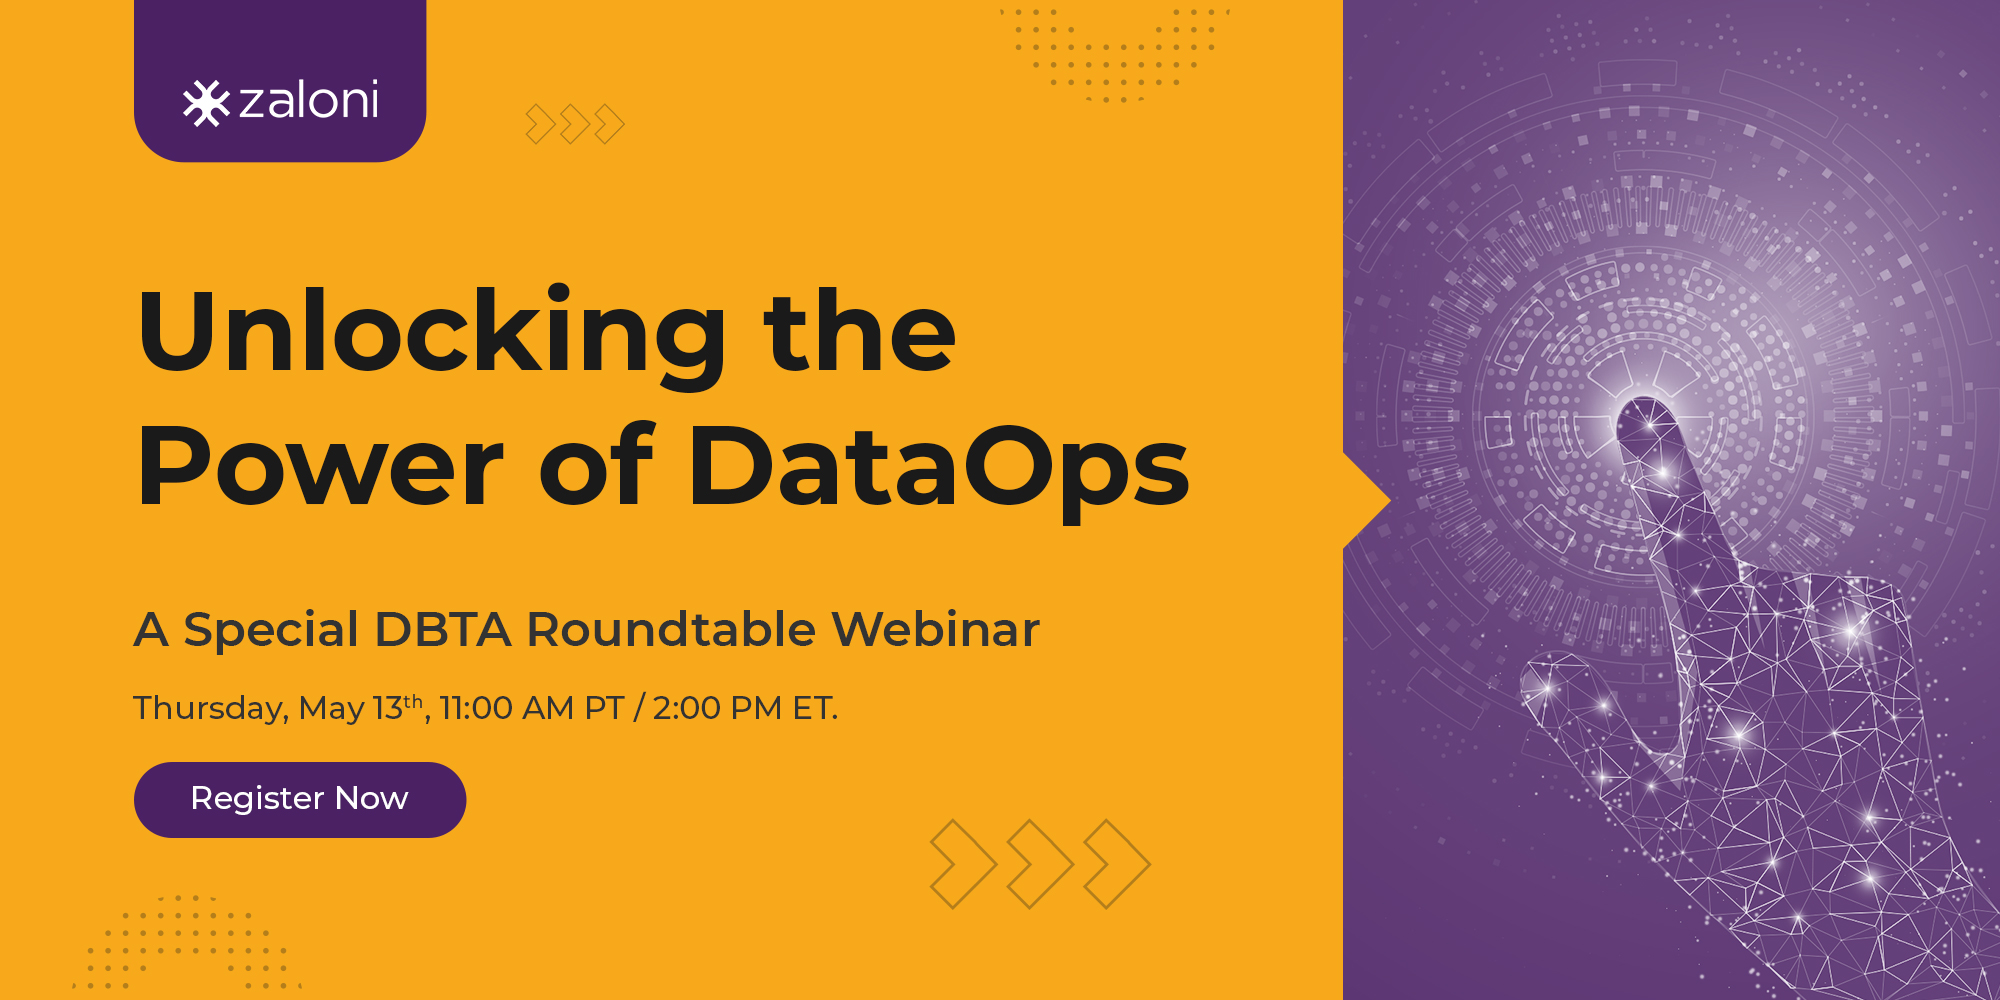 Unlocking the Power of DataOps – Special DBTA Roundtable Webinar